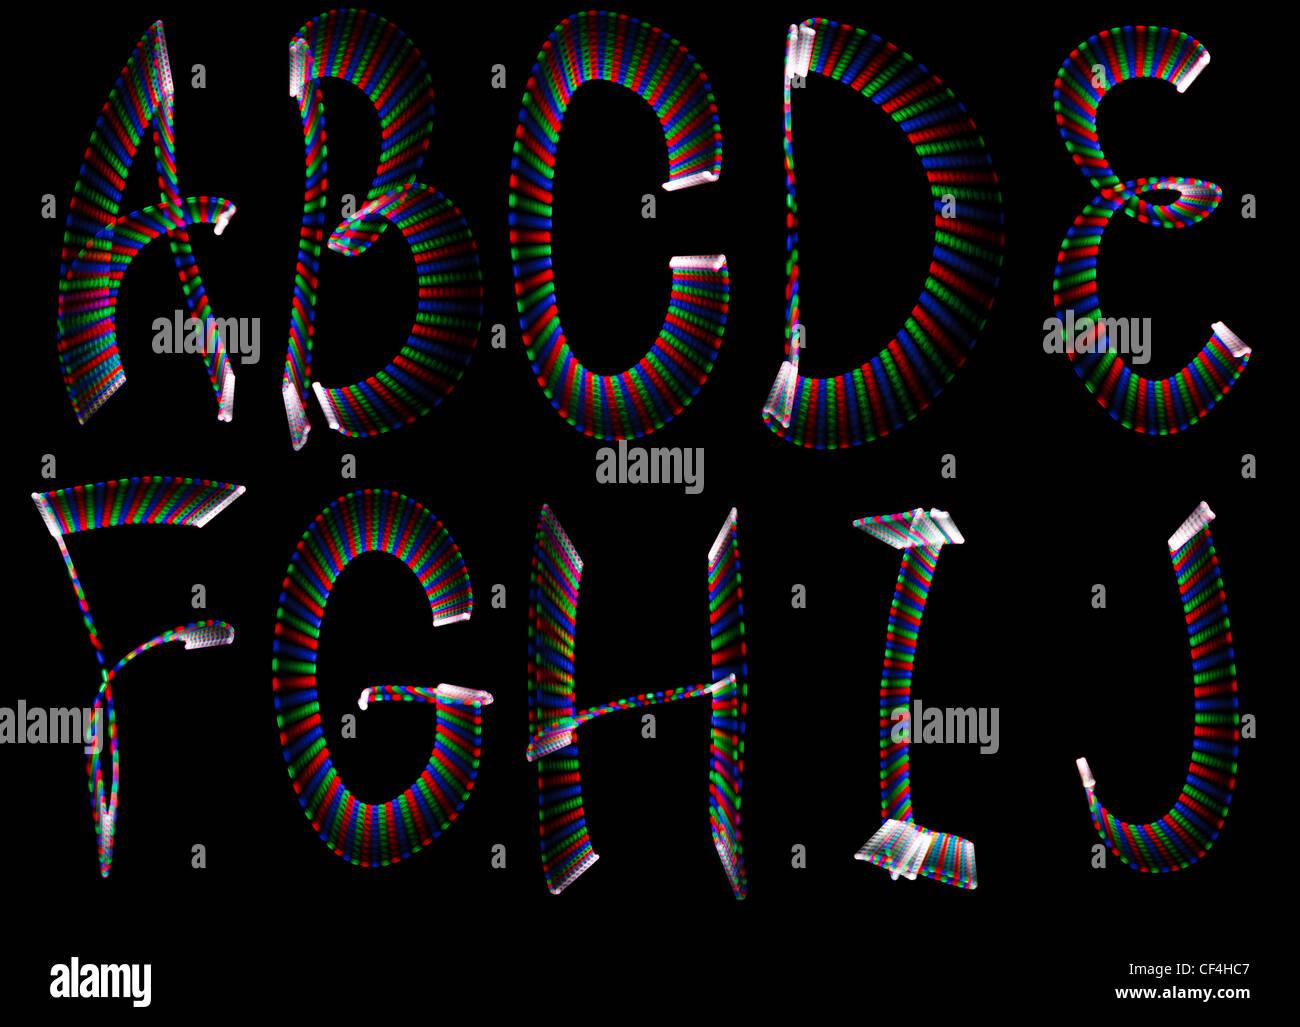 Bright rainbow letters, part of english alphabet on black background. Isolated. - Stock Image